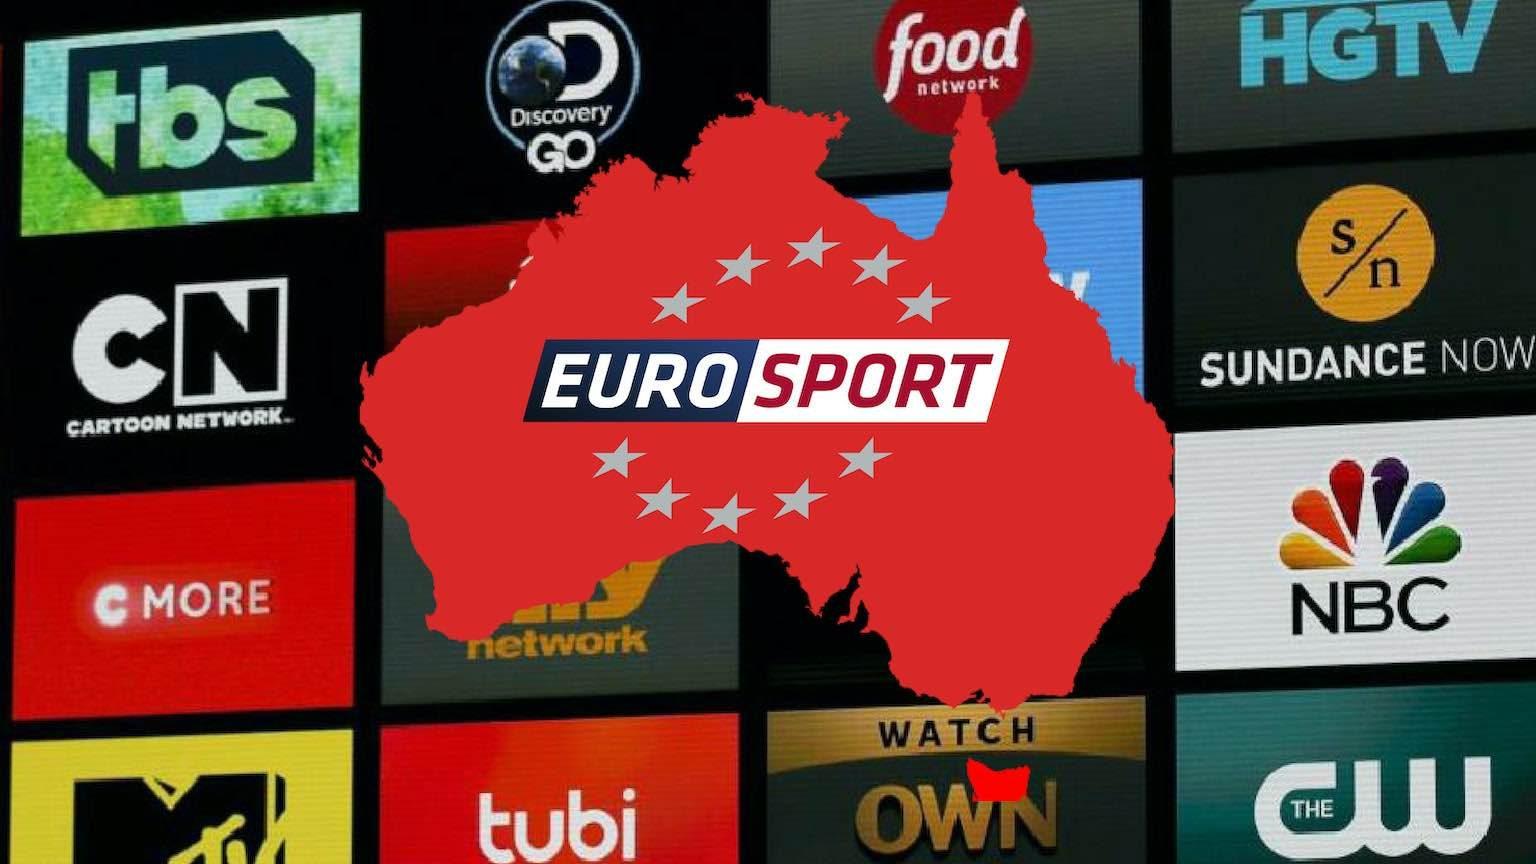 Watch Eurosport M